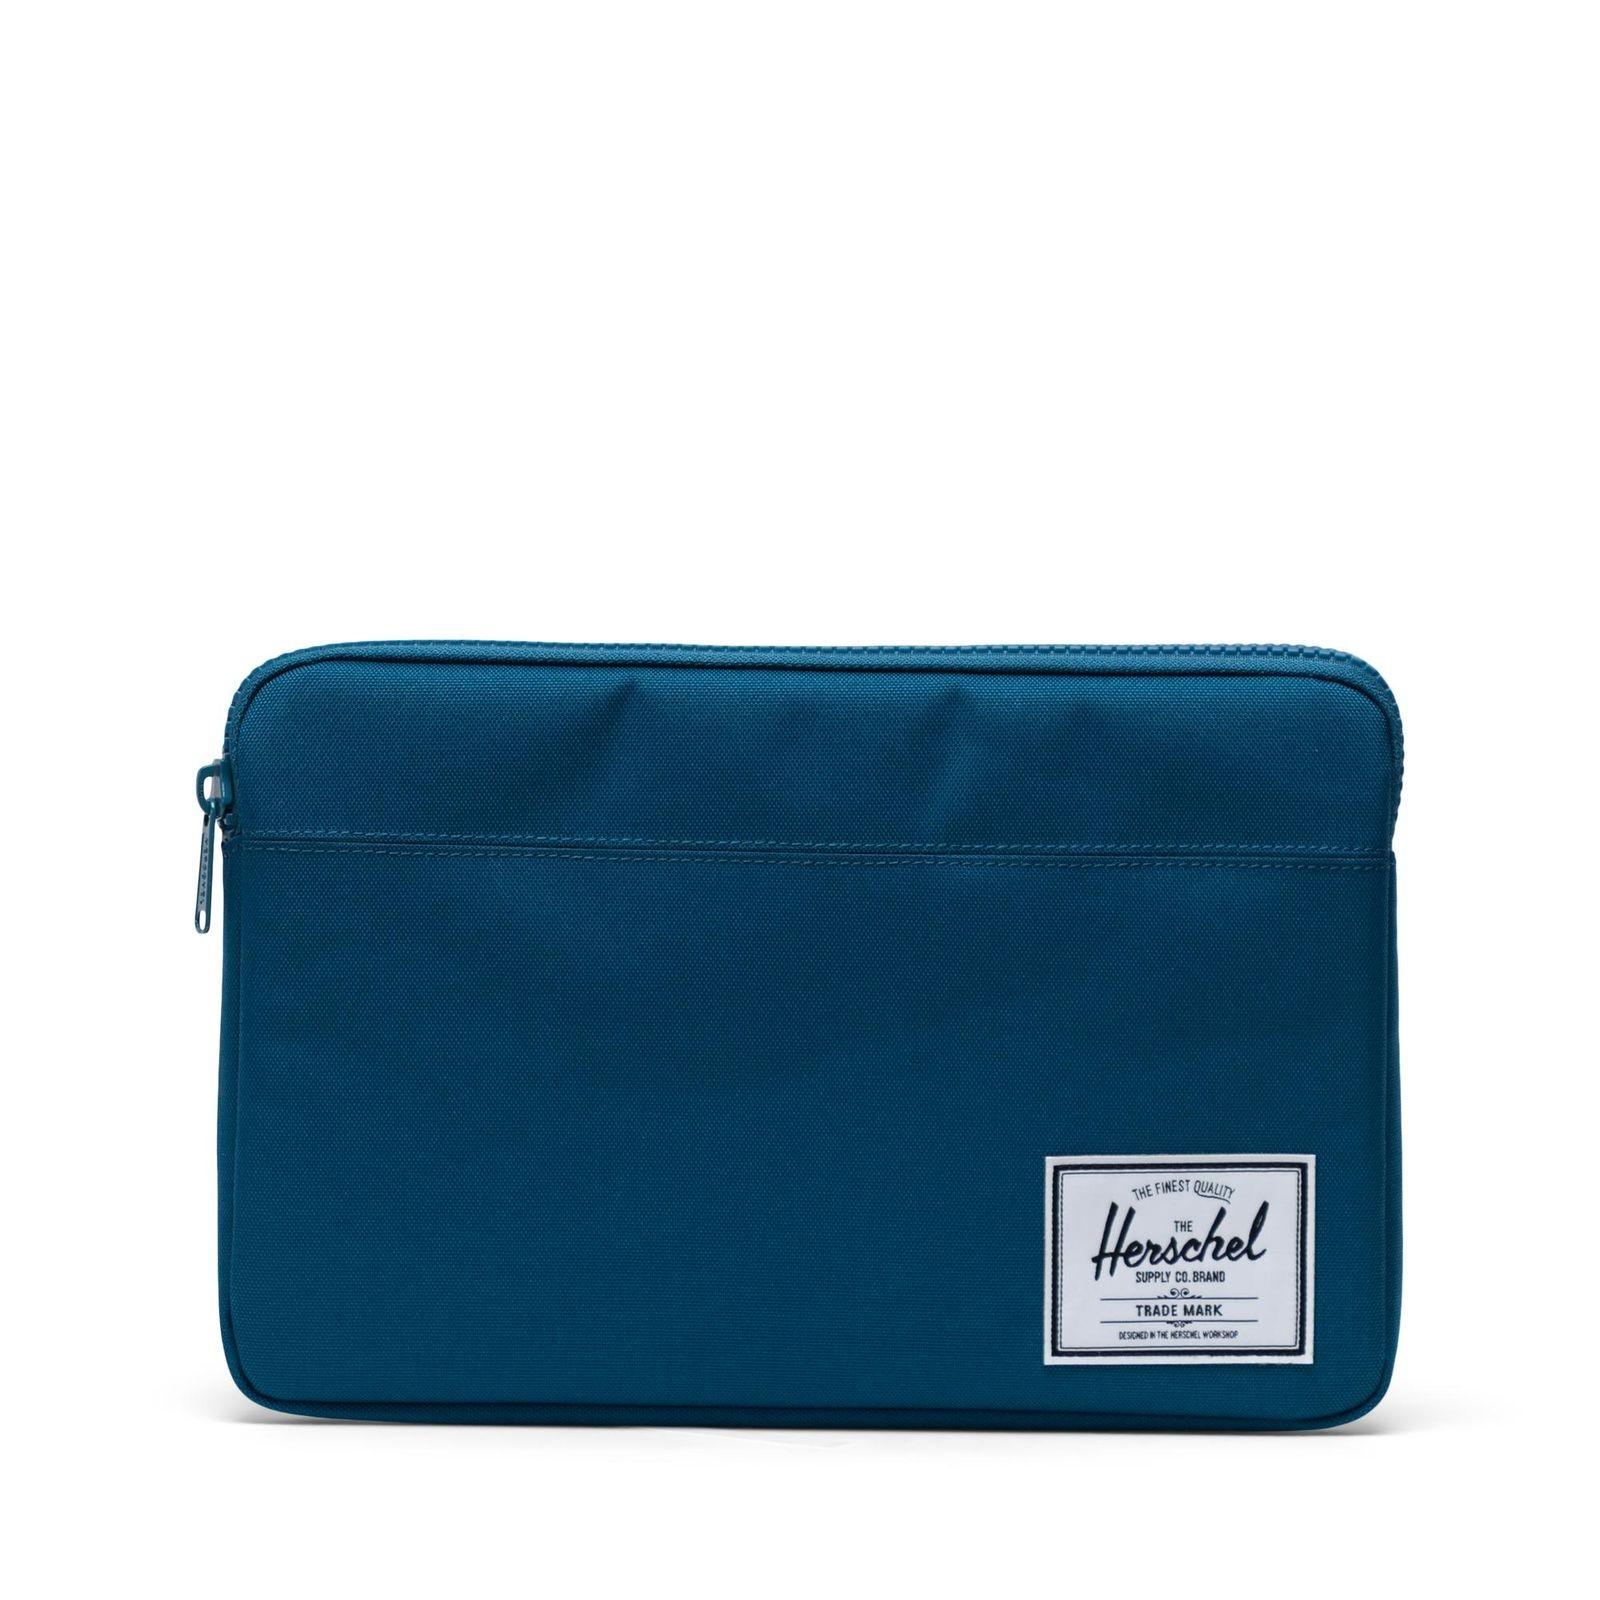 Herschel Laptop Kılıfı Anchor Sleeve for 12 inch MacBook Moroccan Blue